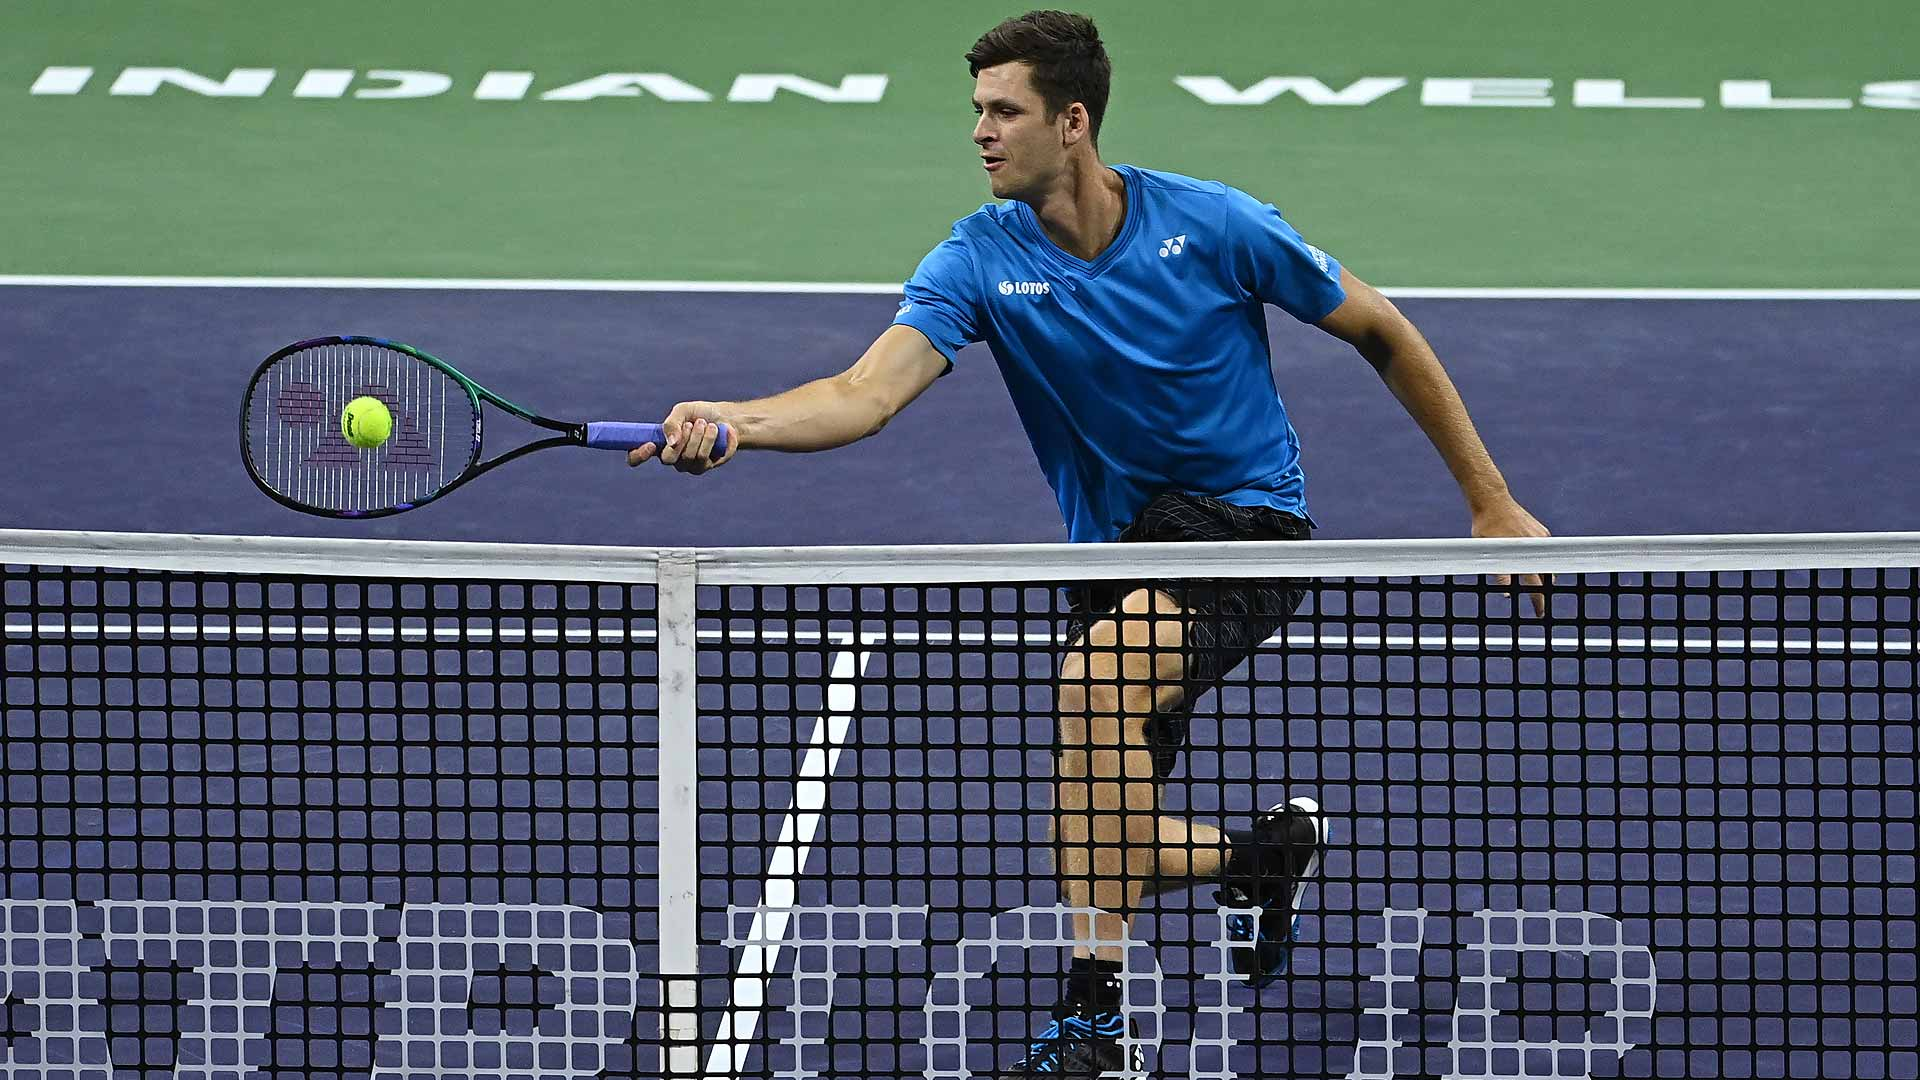 Indian Wells 2021: Hubert Hurkacz vs. Aslan Karatsev Tennis Pick and Prediction